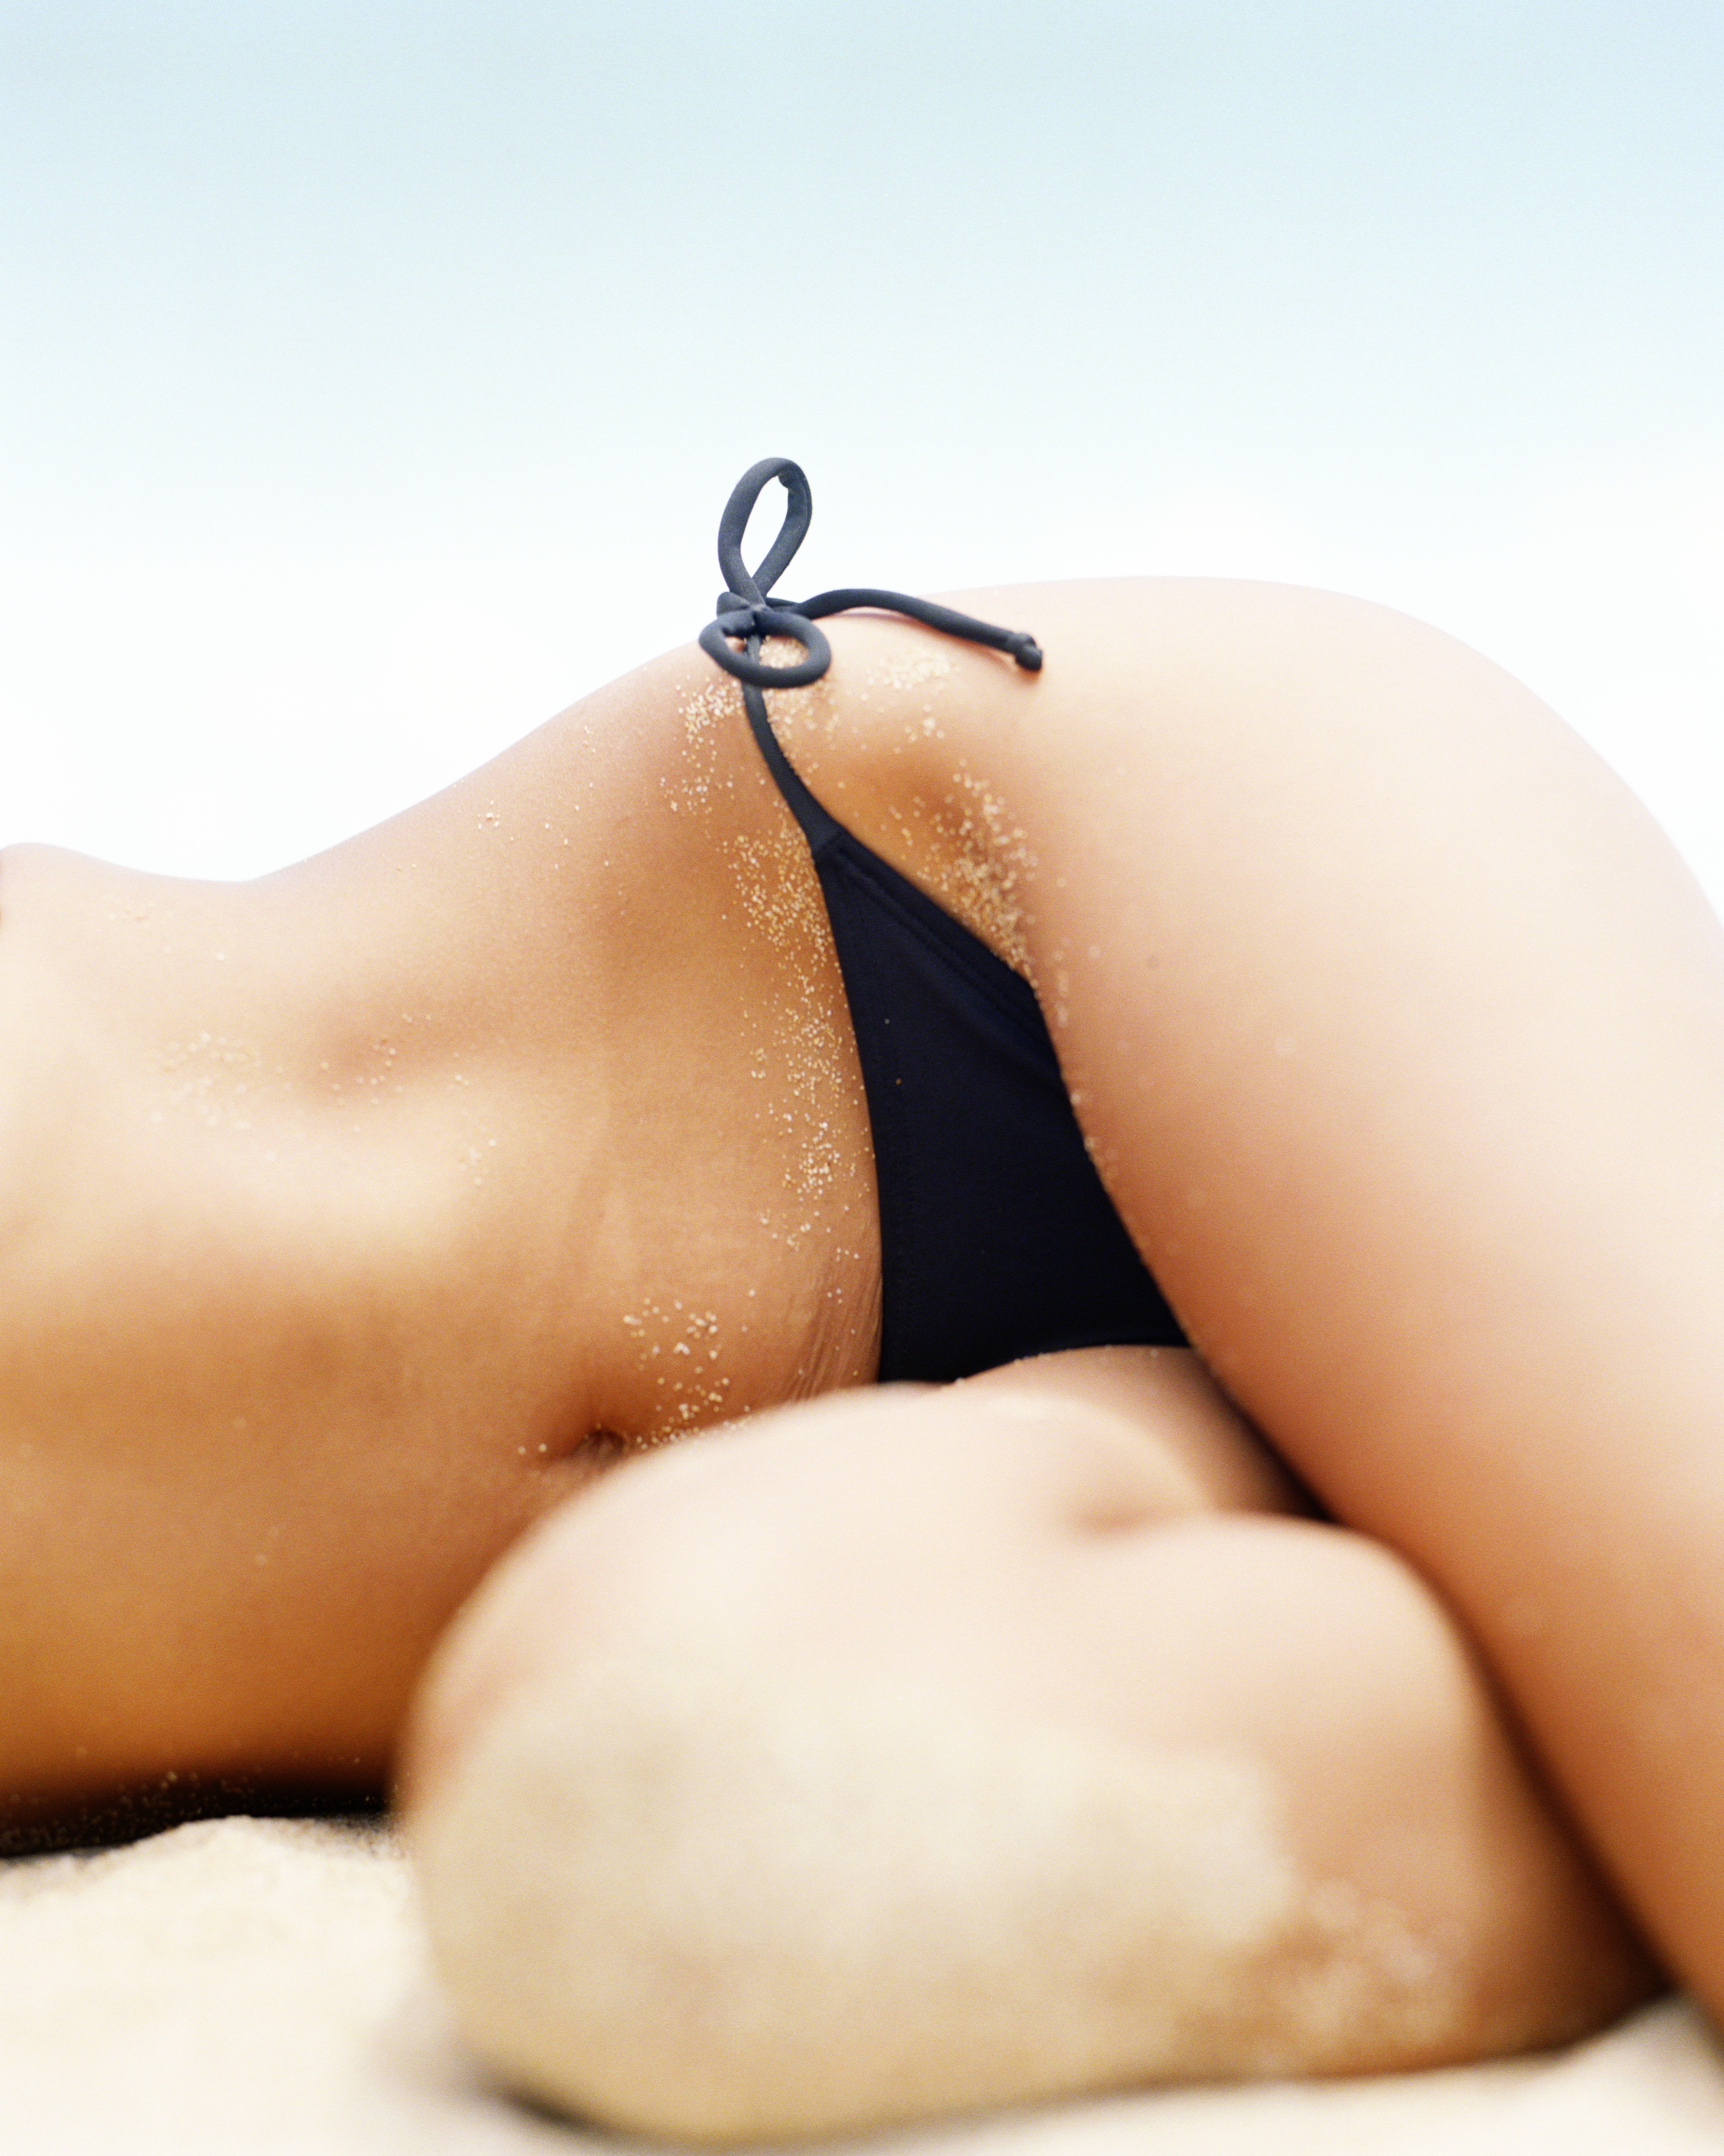 Woman wearing black bikini , lying in sand on beach, mid section